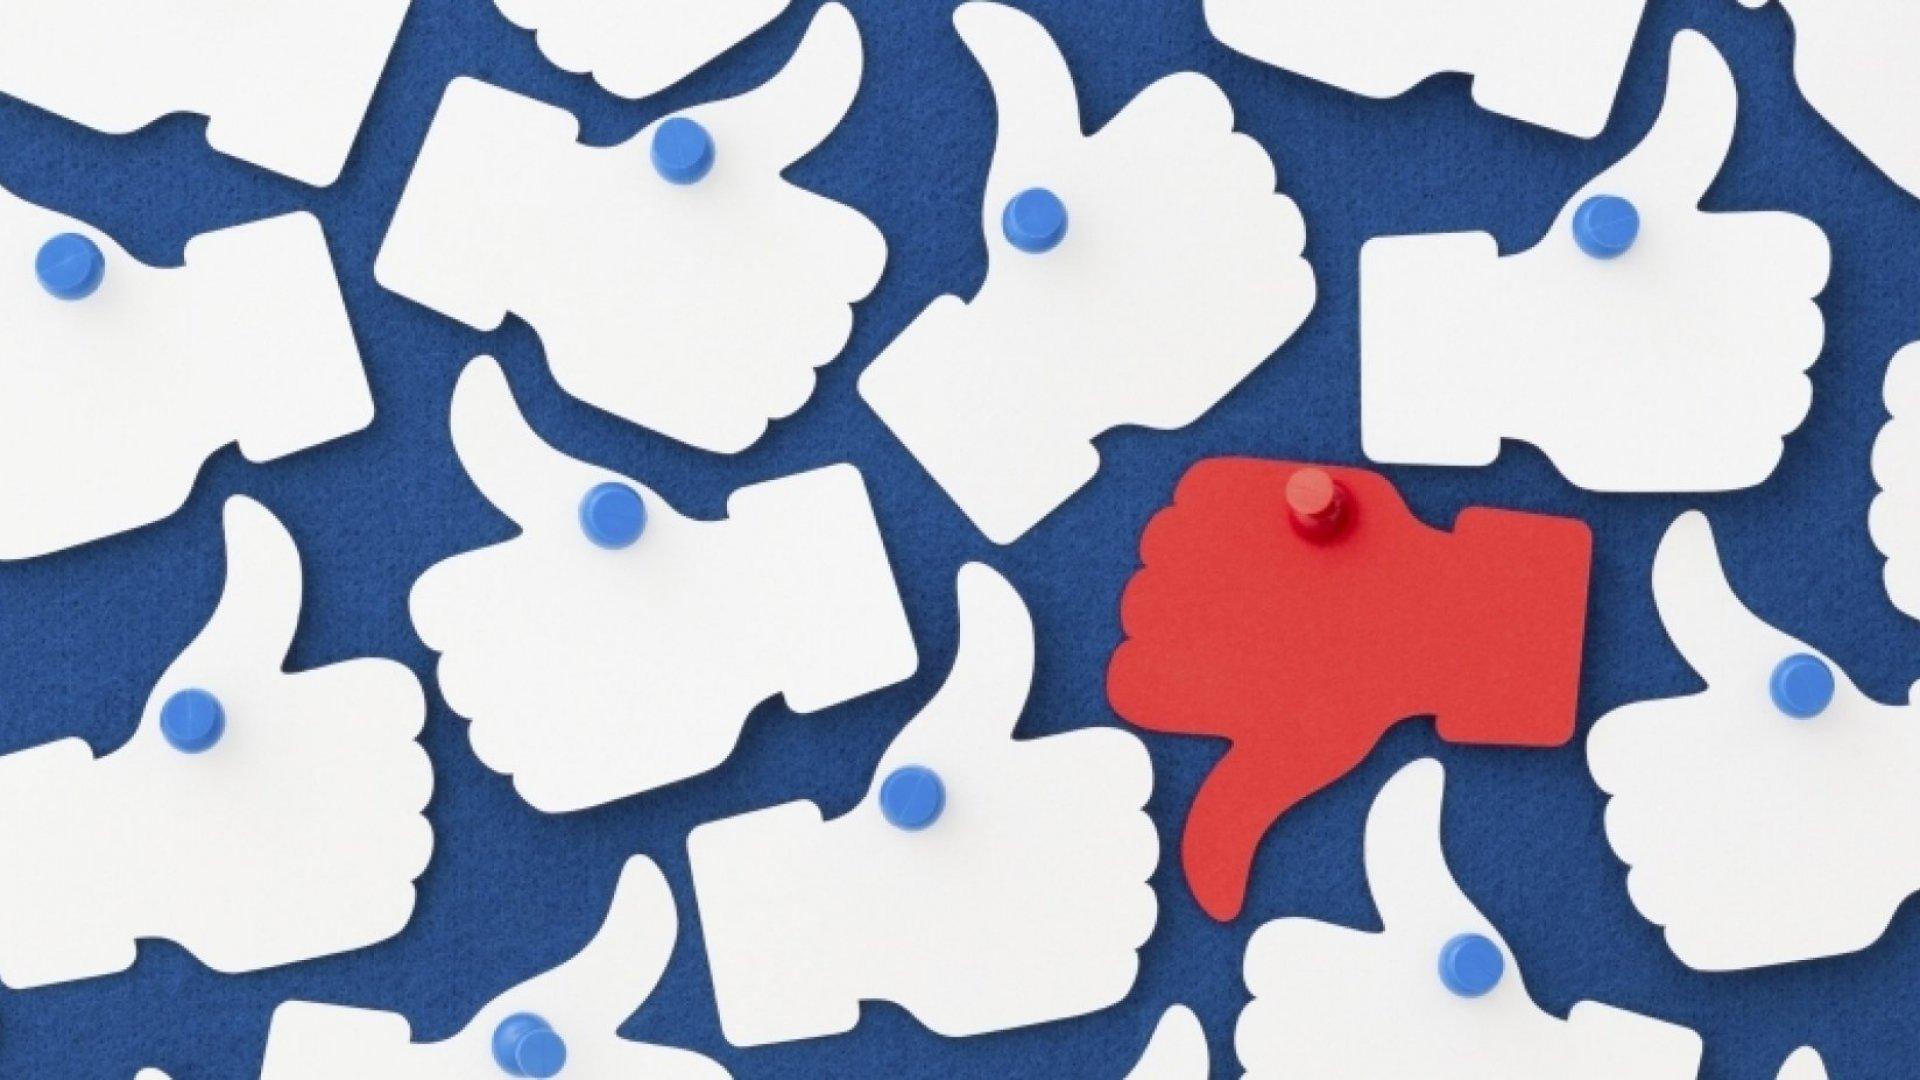 9 Effective Ways to Handle Negativity on Social Media